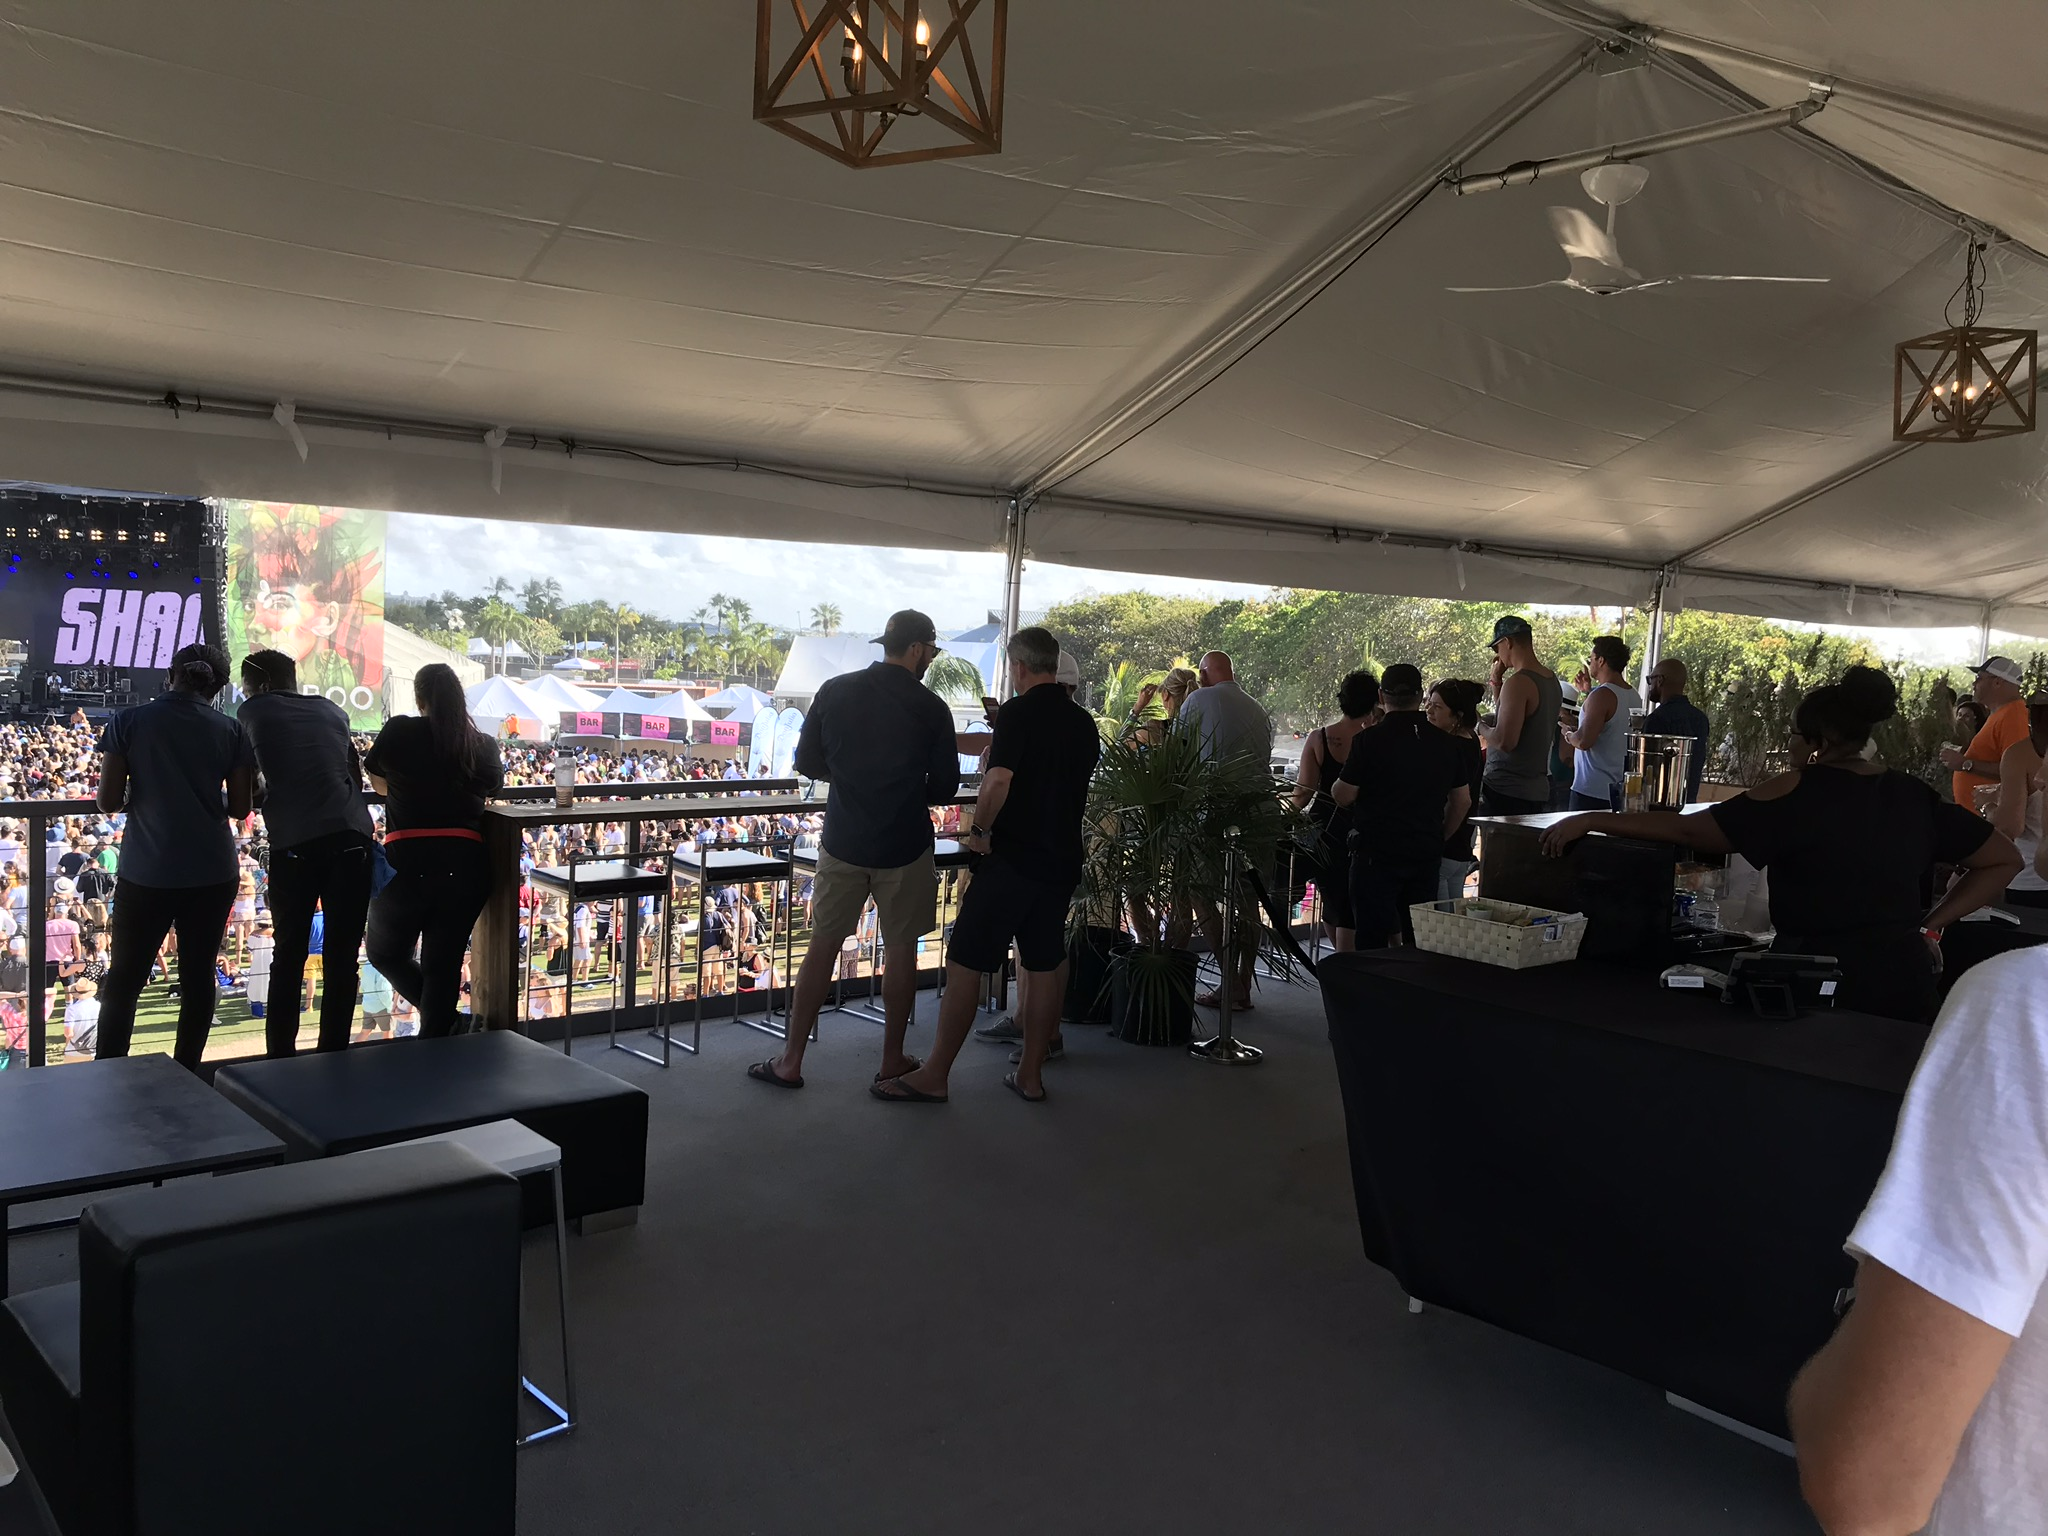 5' Overhead Fan in the VIP Tent